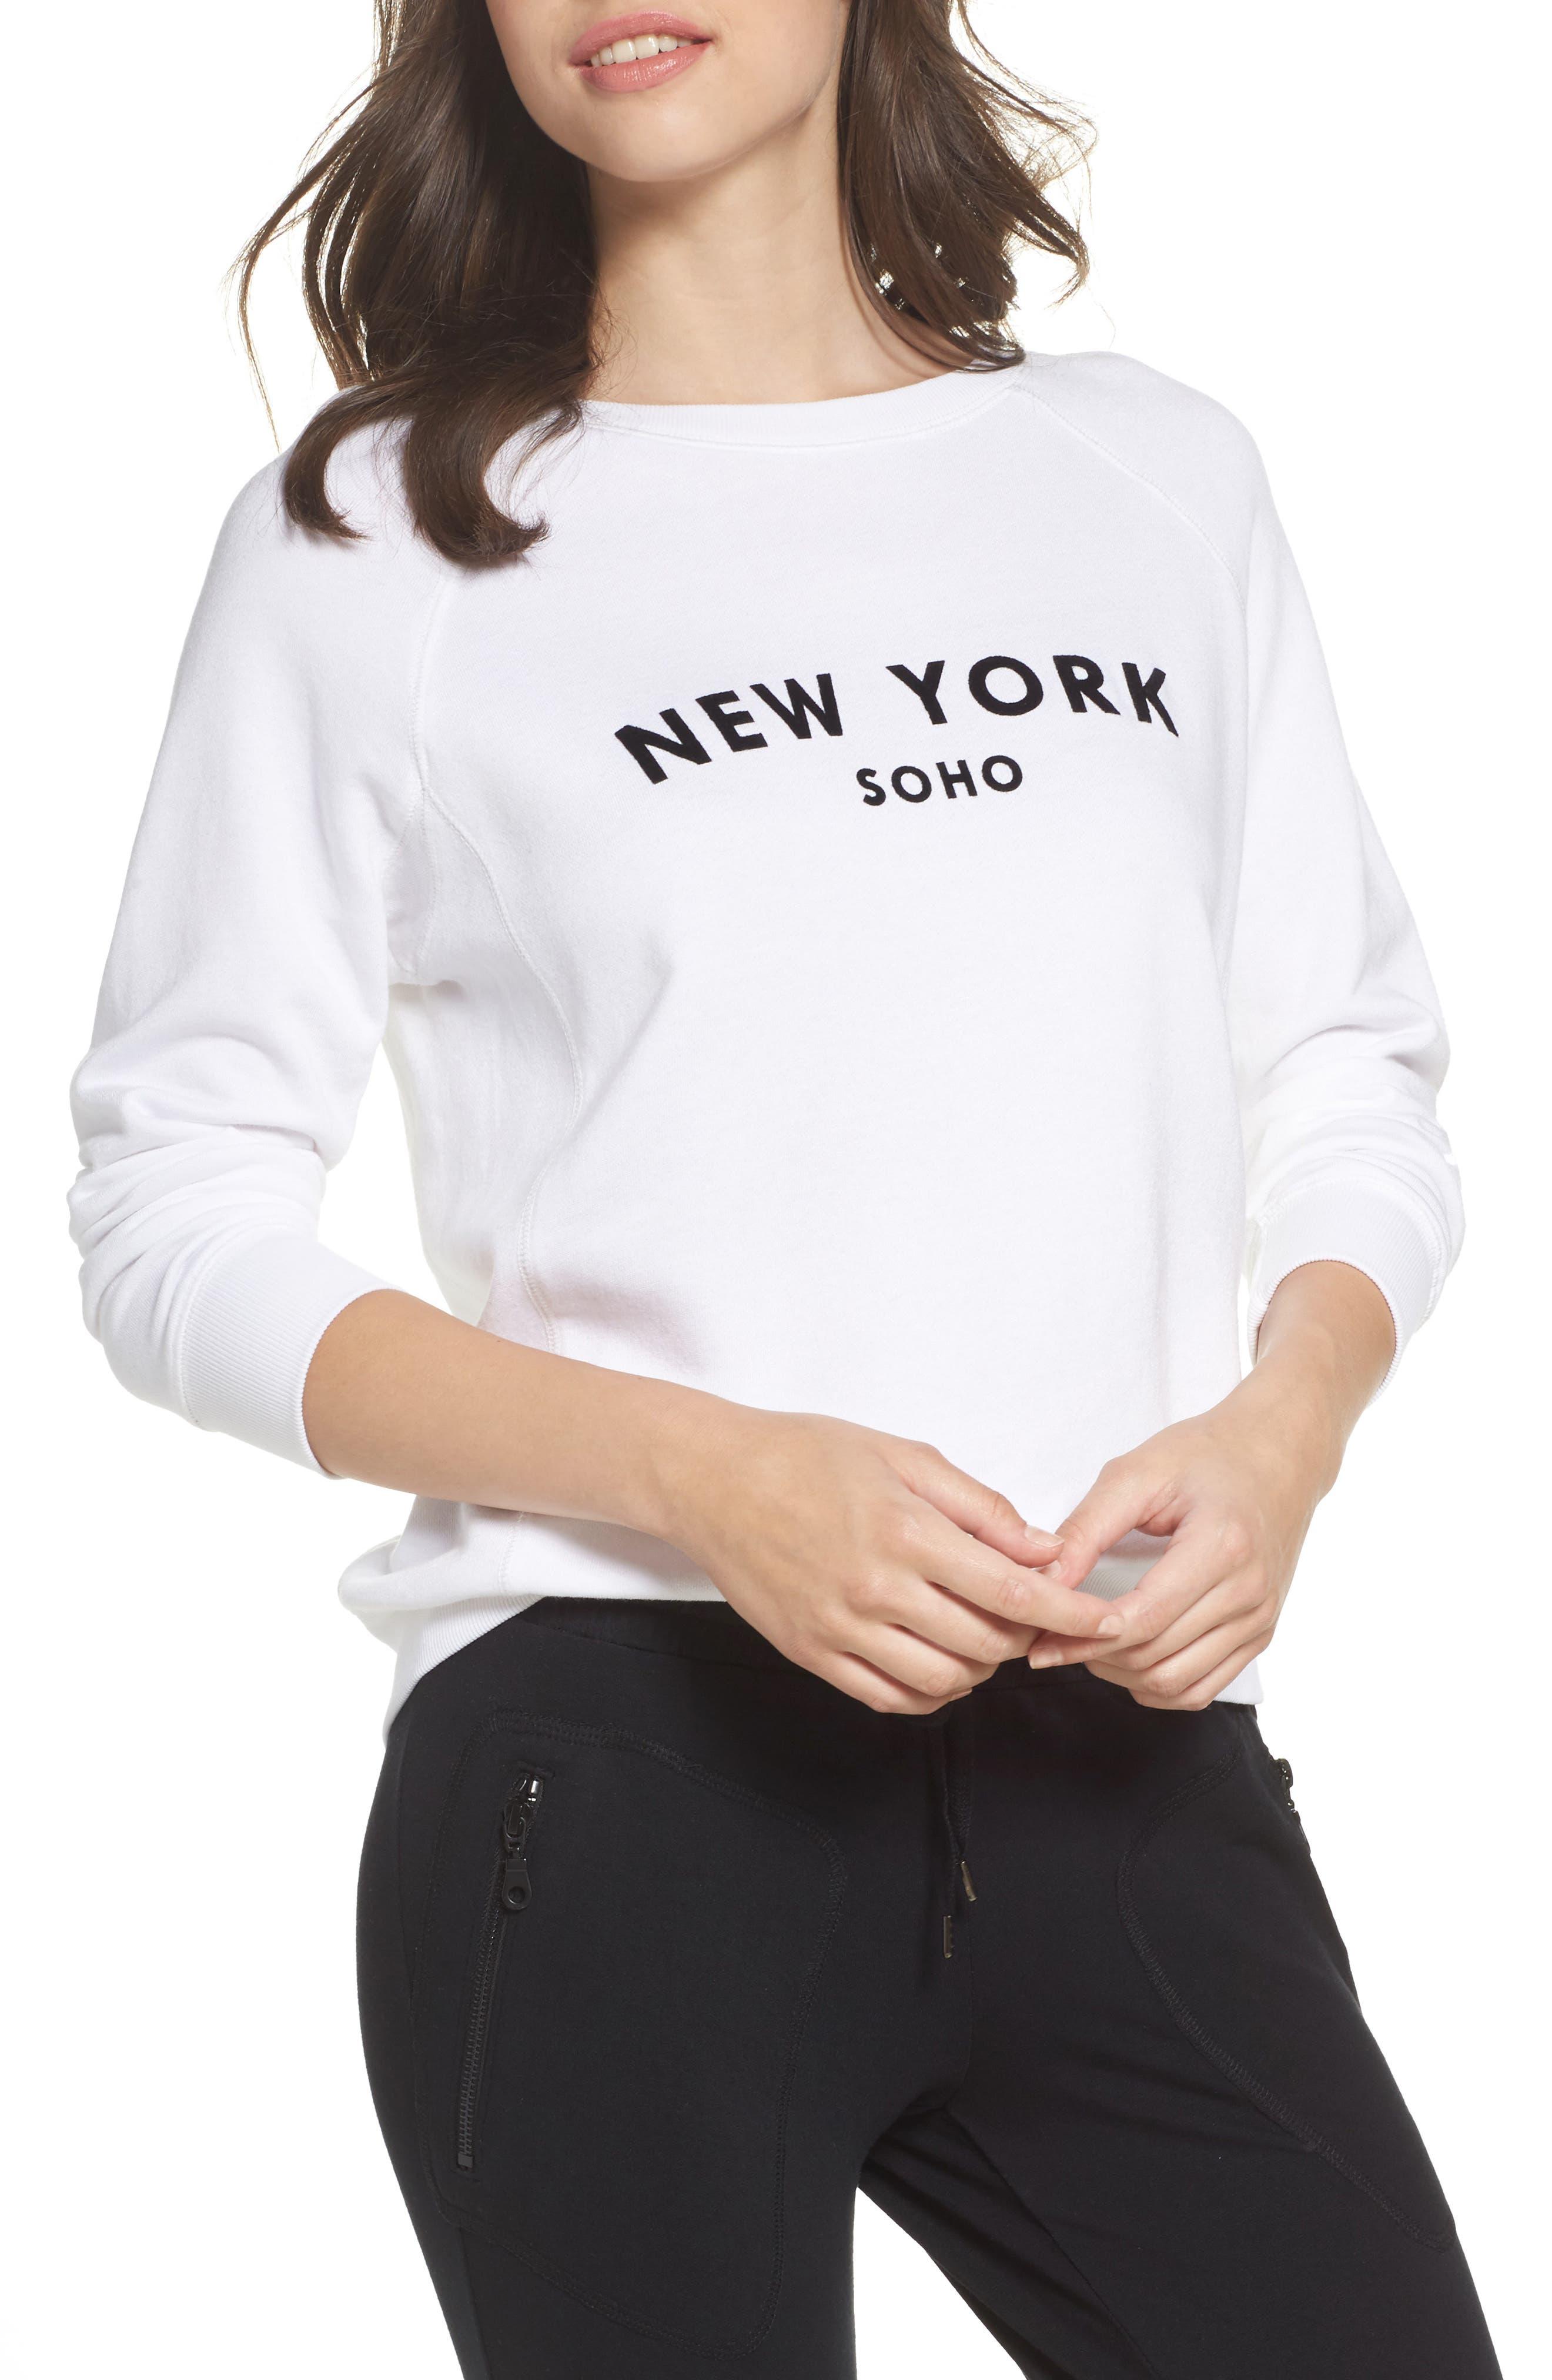 Main Image - David Lerner New York Soho Raglan Pullover